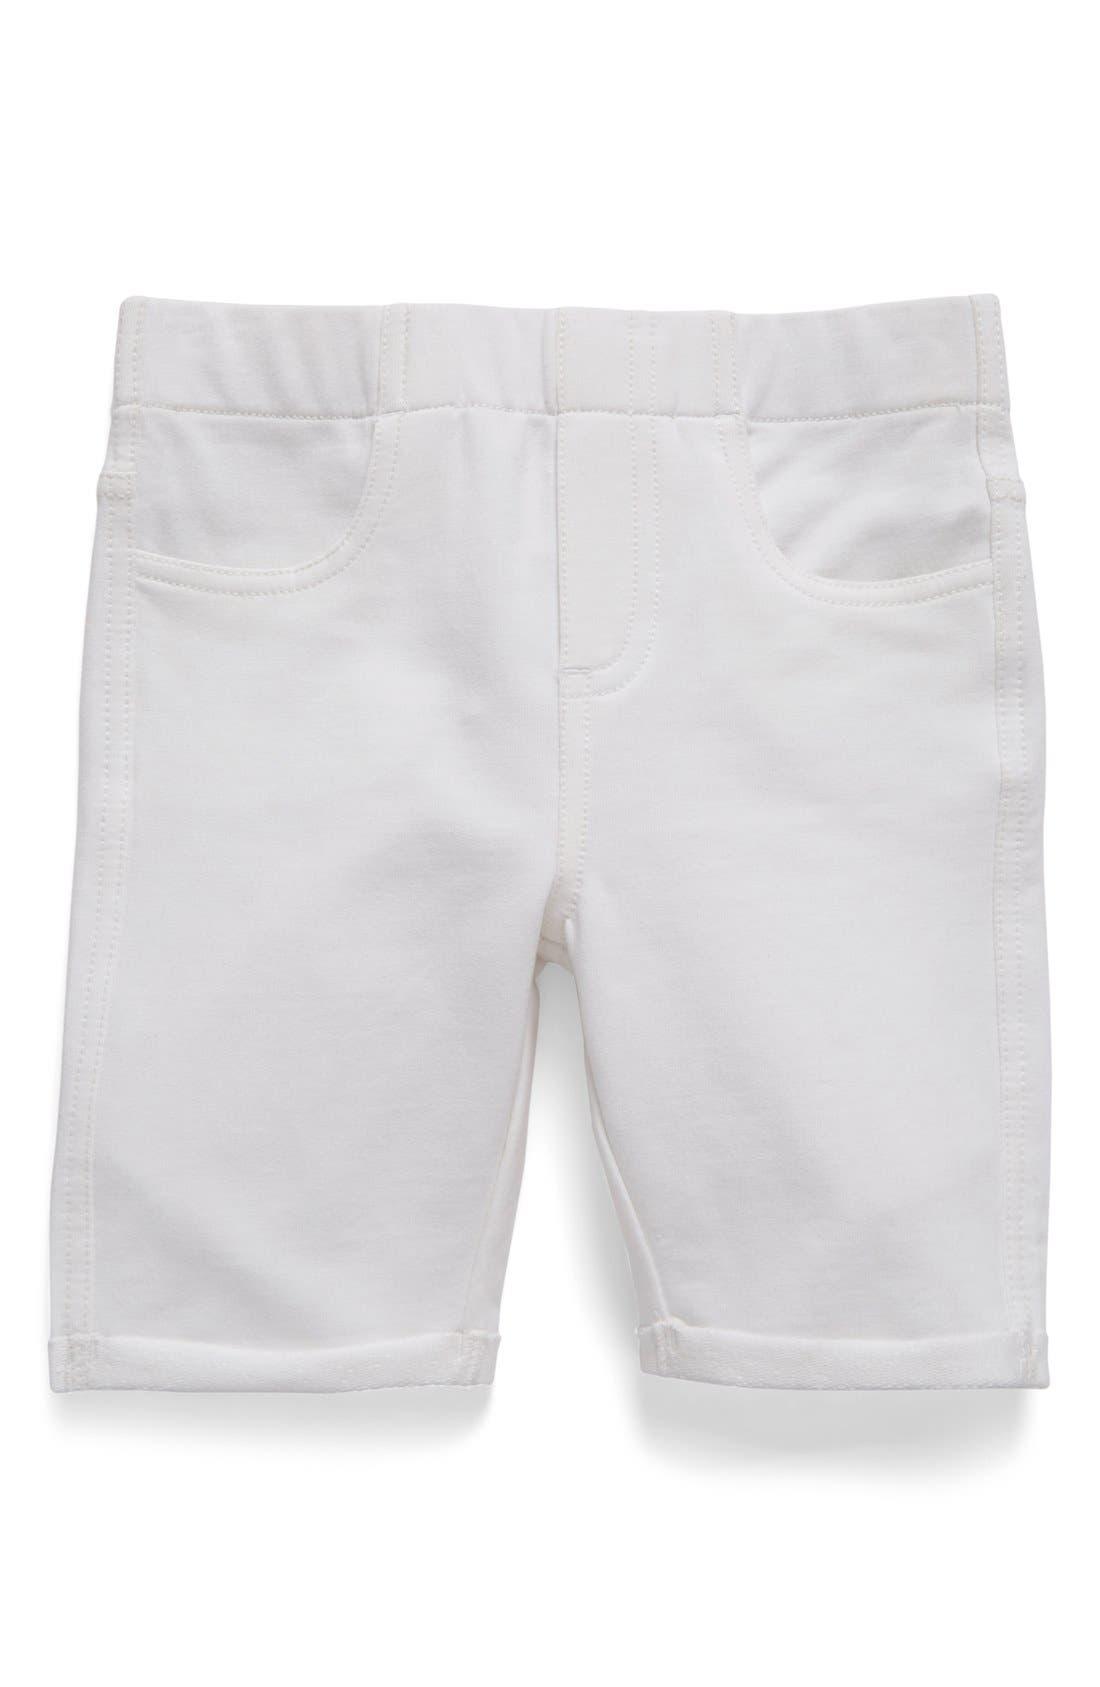 'Jenna' Jegging Shorts,                         Main,                         color, WHITE